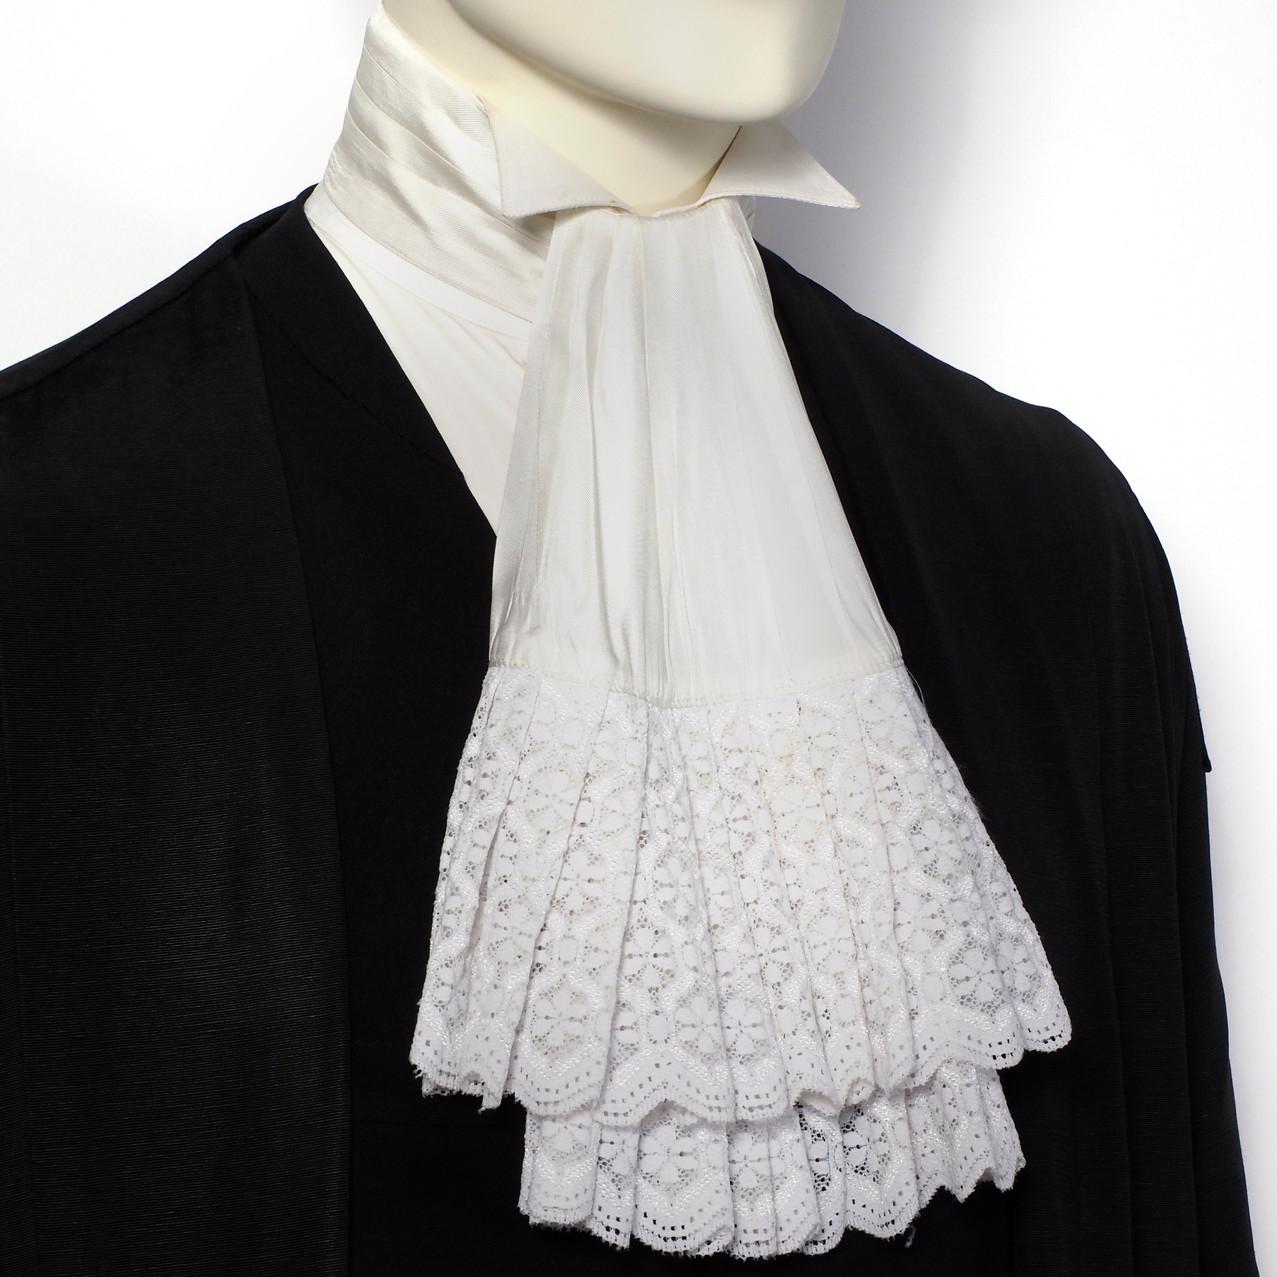 Jabot as neckwear